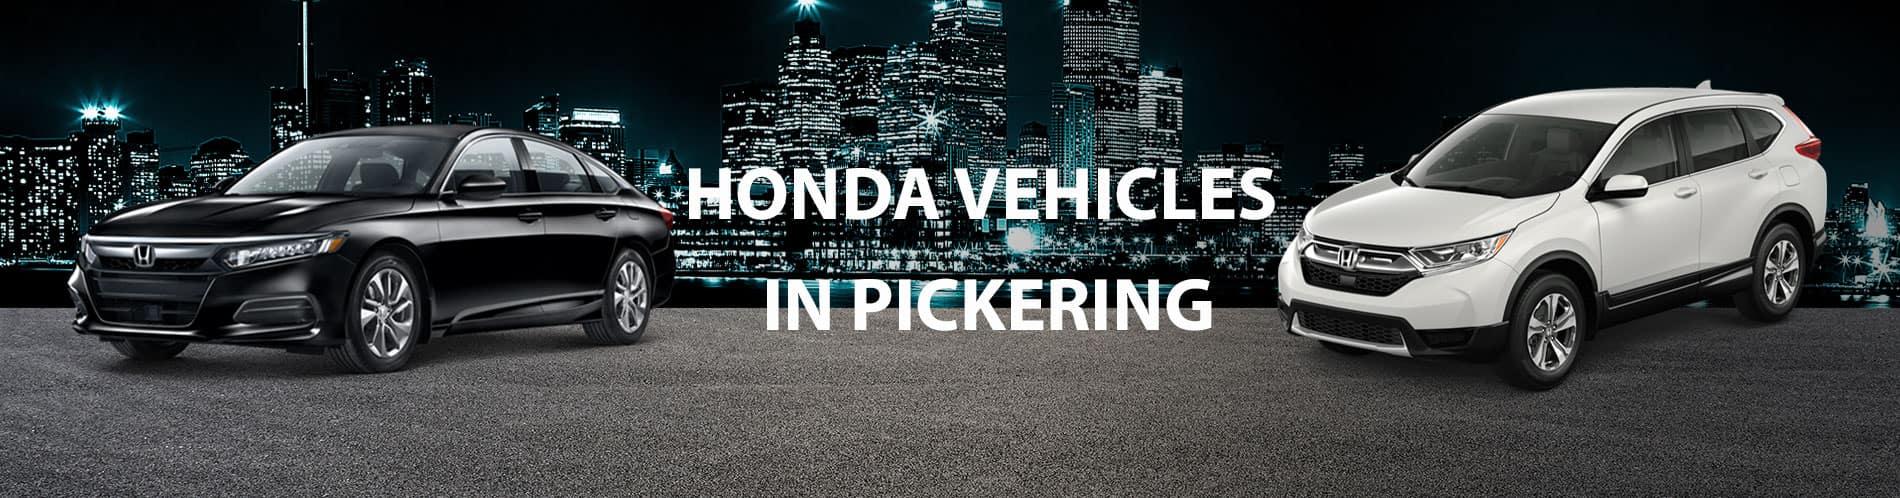 2021 & 2020 Honda vehicles available at Pickering Honda